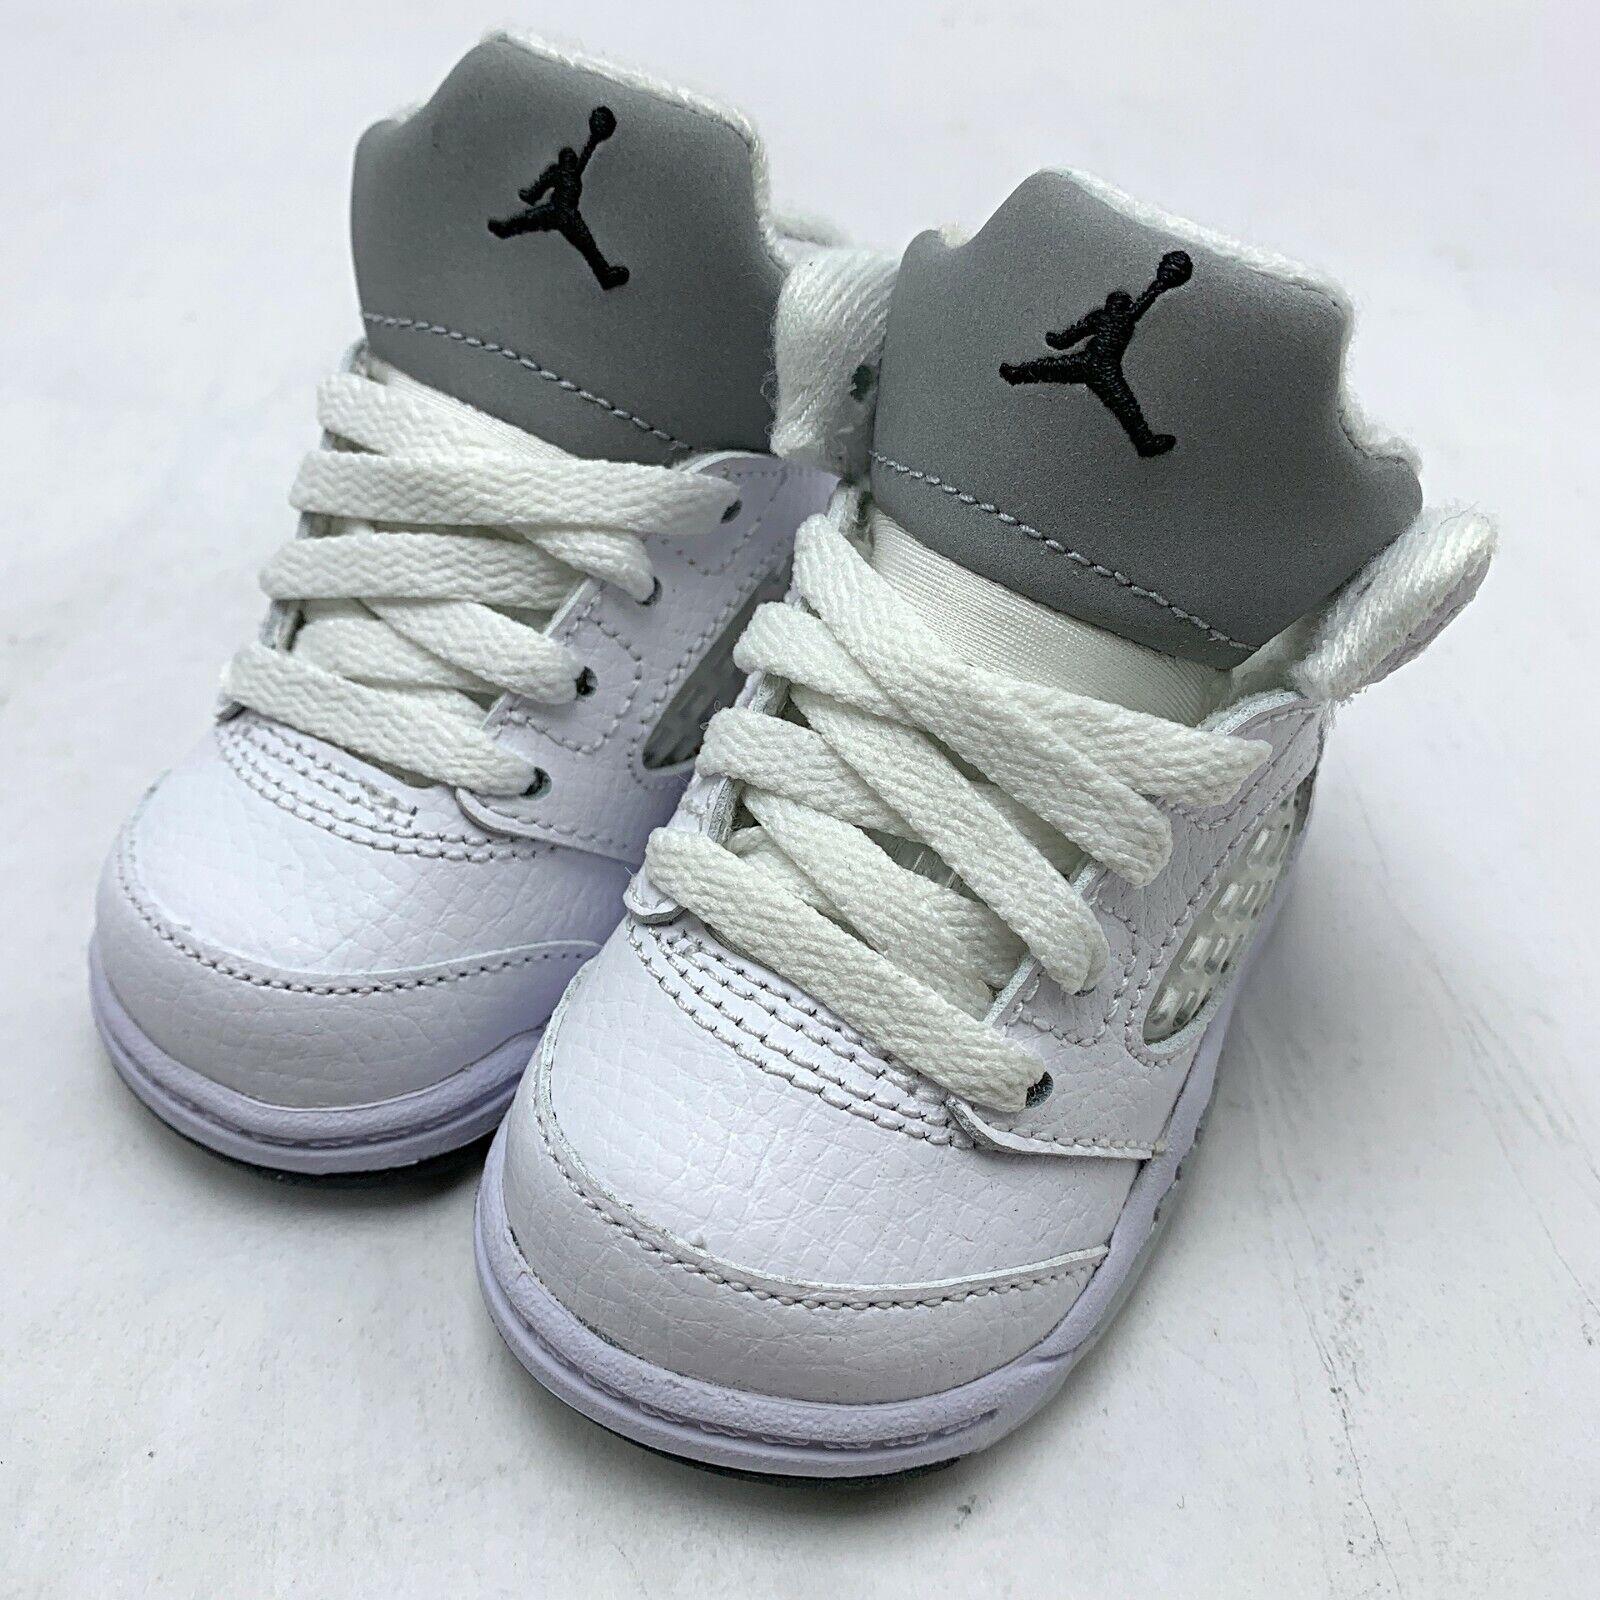 Nike Jordan 5 Retro BT Baby Shoes White/Black-Metallic Silver size 2c 440890-130